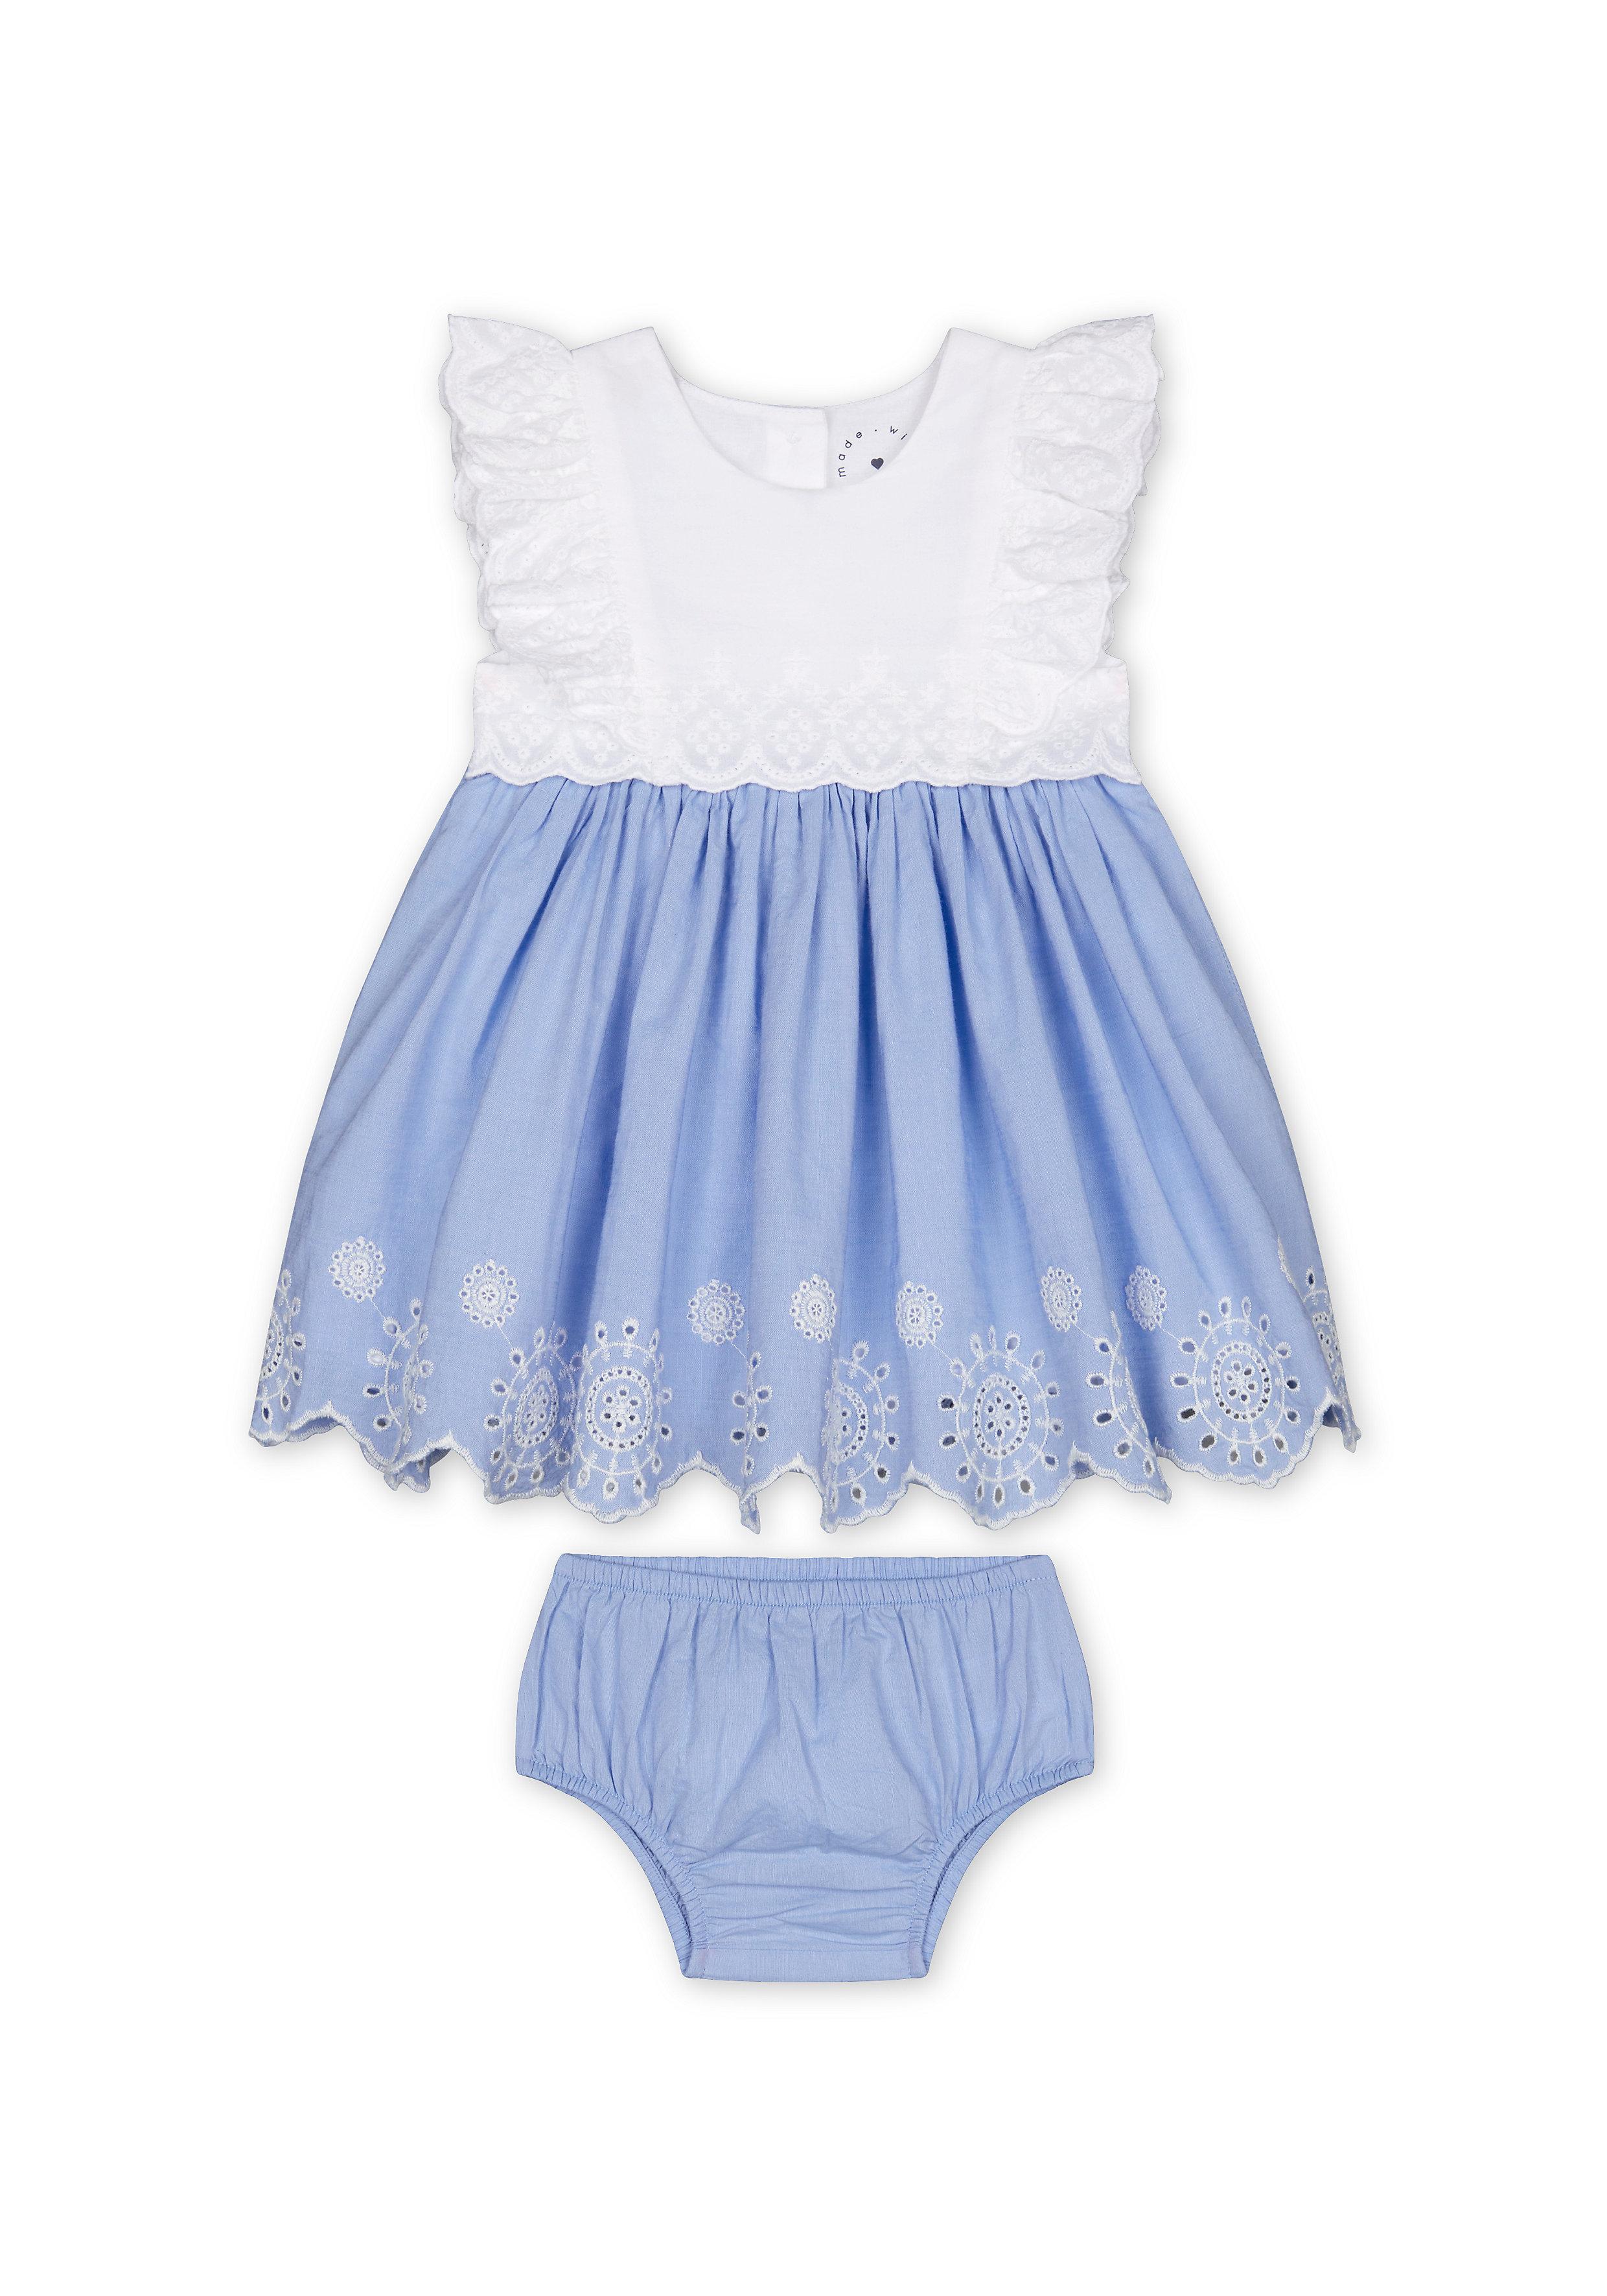 Mothercare   Girls Sleeveless Dress And Knickers Set Schiffli Detail - Blue